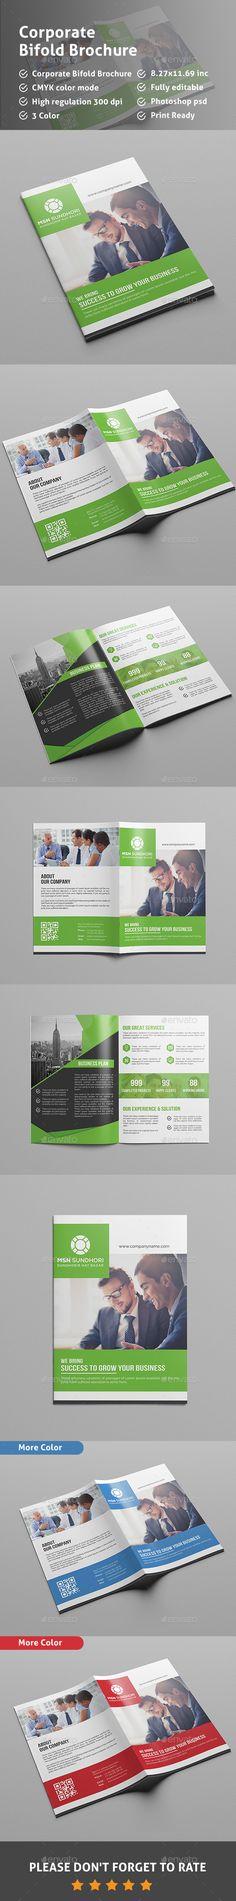 Bi Fold Brochure Template PSD. Download here: http://graphicriver.net/item/bi-fold-brochure-template/15183091?ref=ksioks